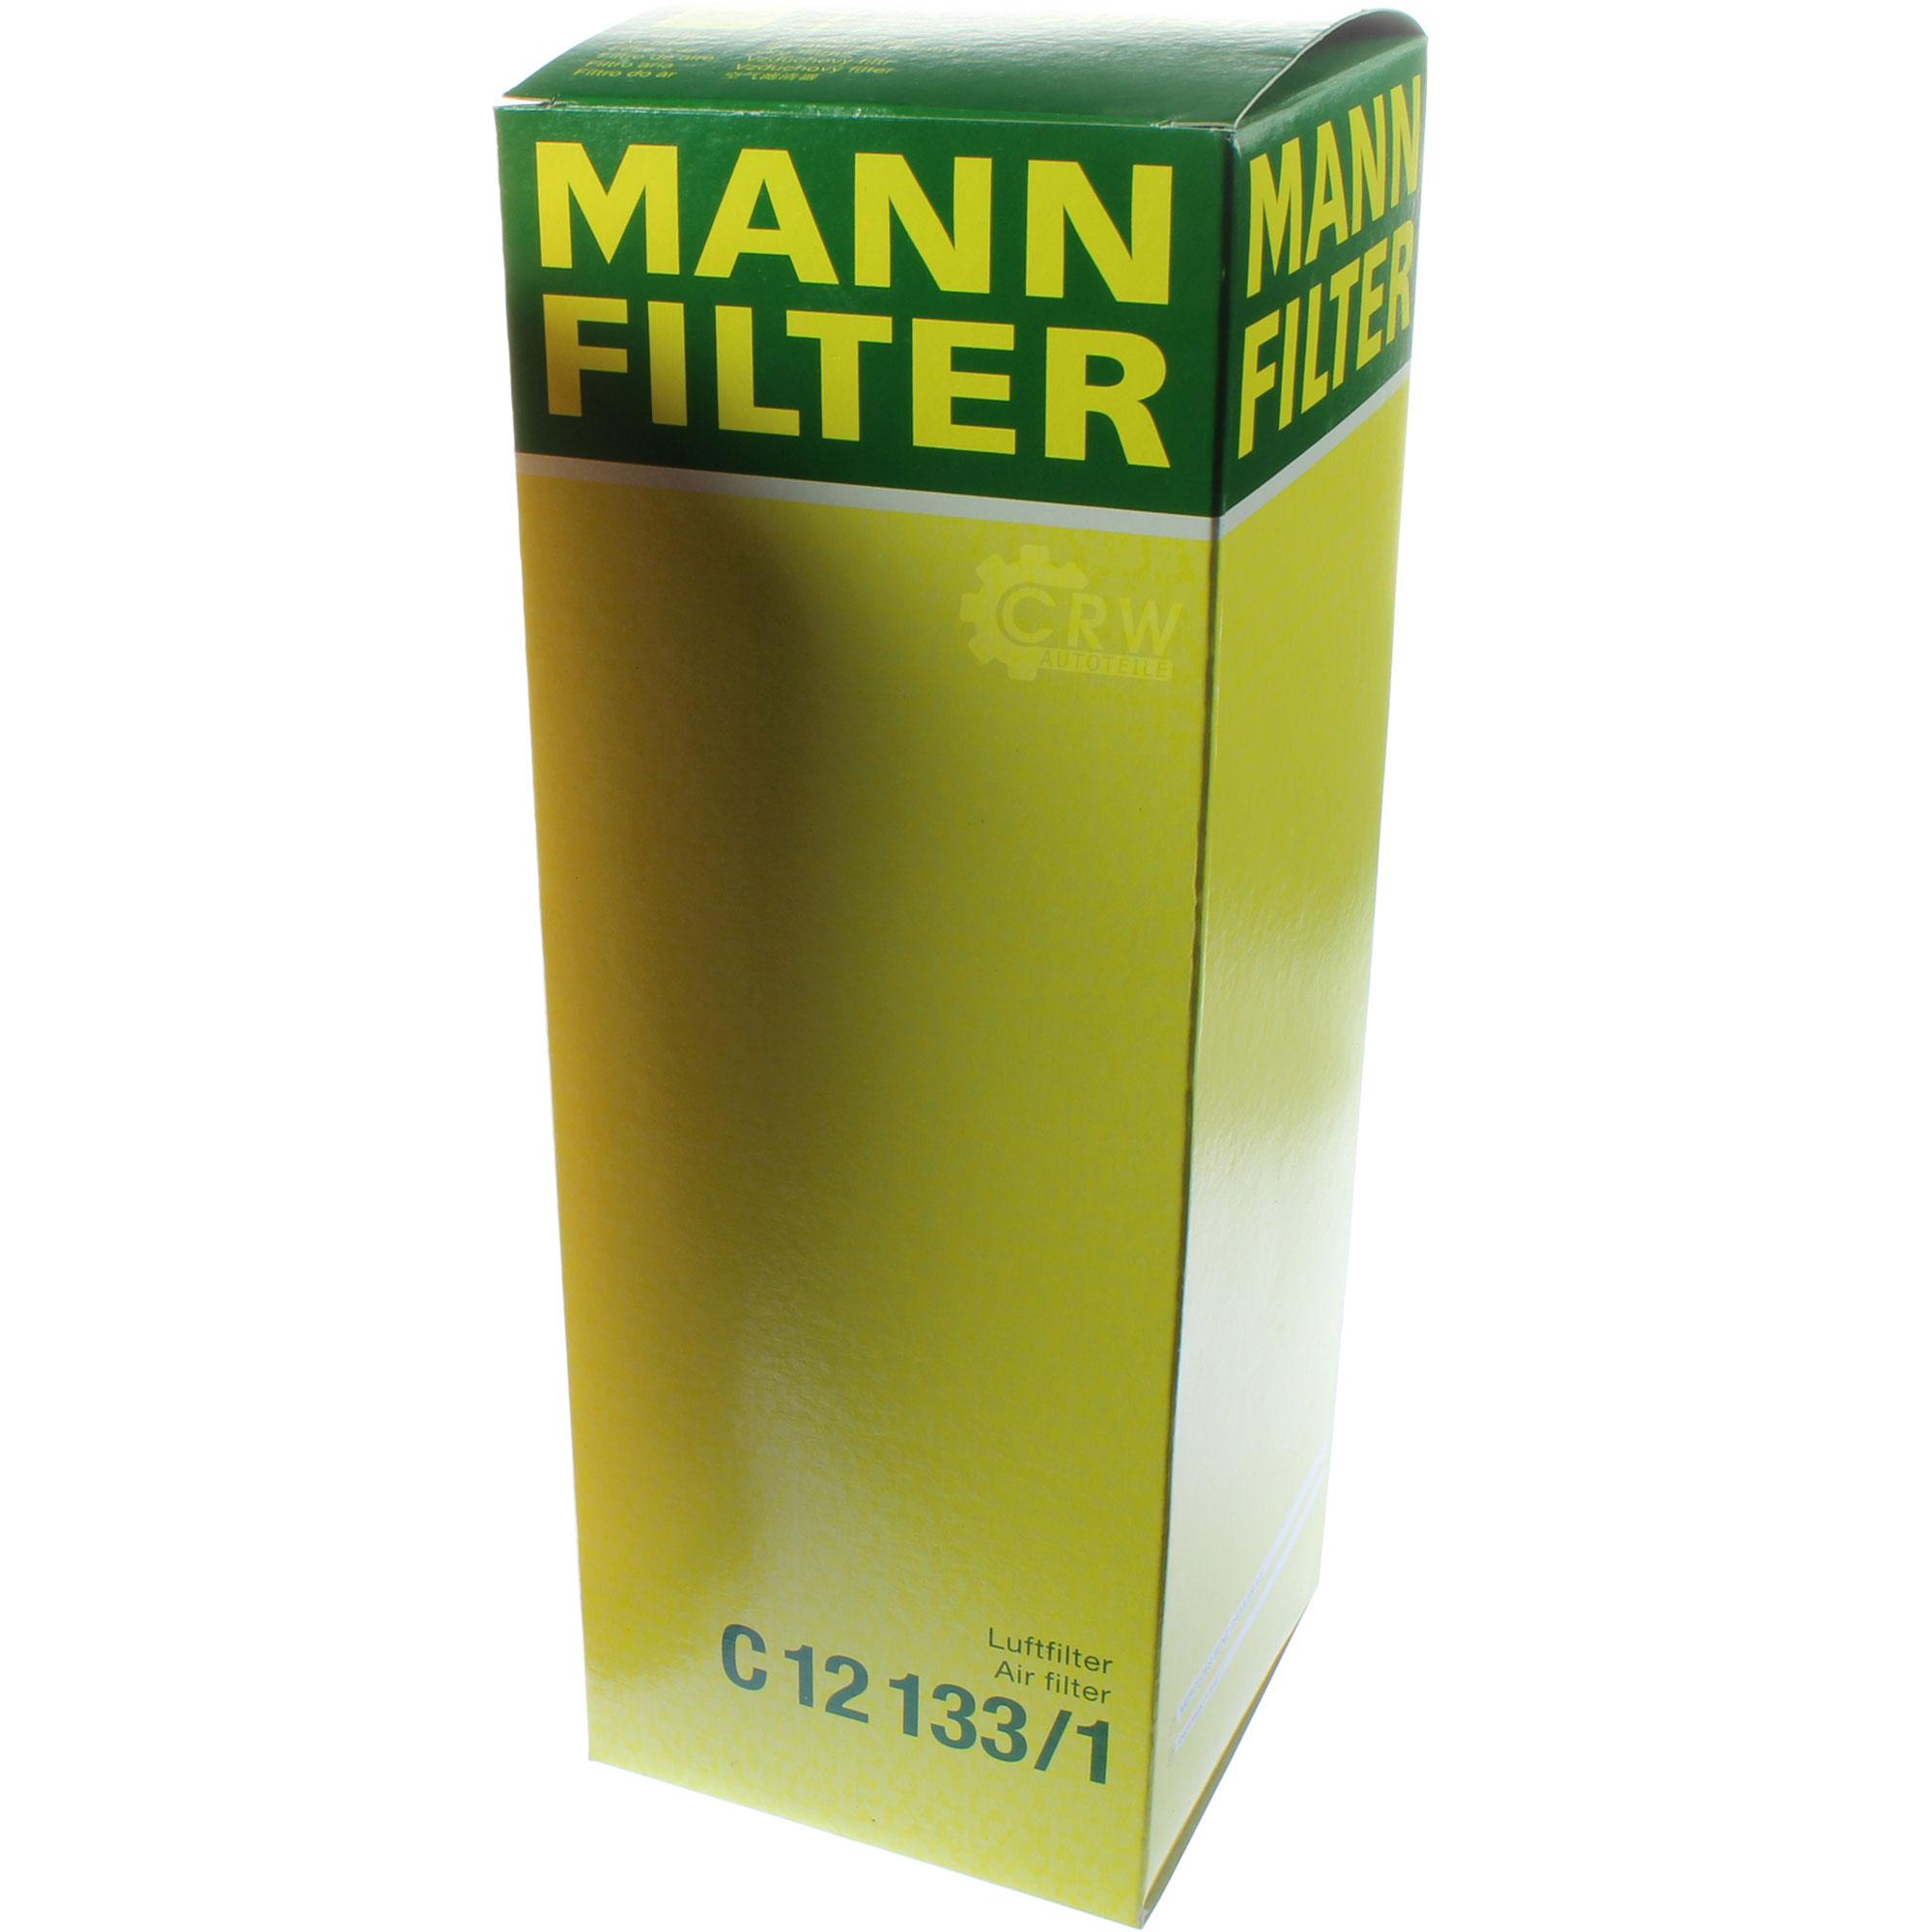 MANNOL-7-L-Energy-Premium-5W-30-MANN-FILTER-Mercedes-C-Klasse-W204-C-220-CDI Indexbild 9